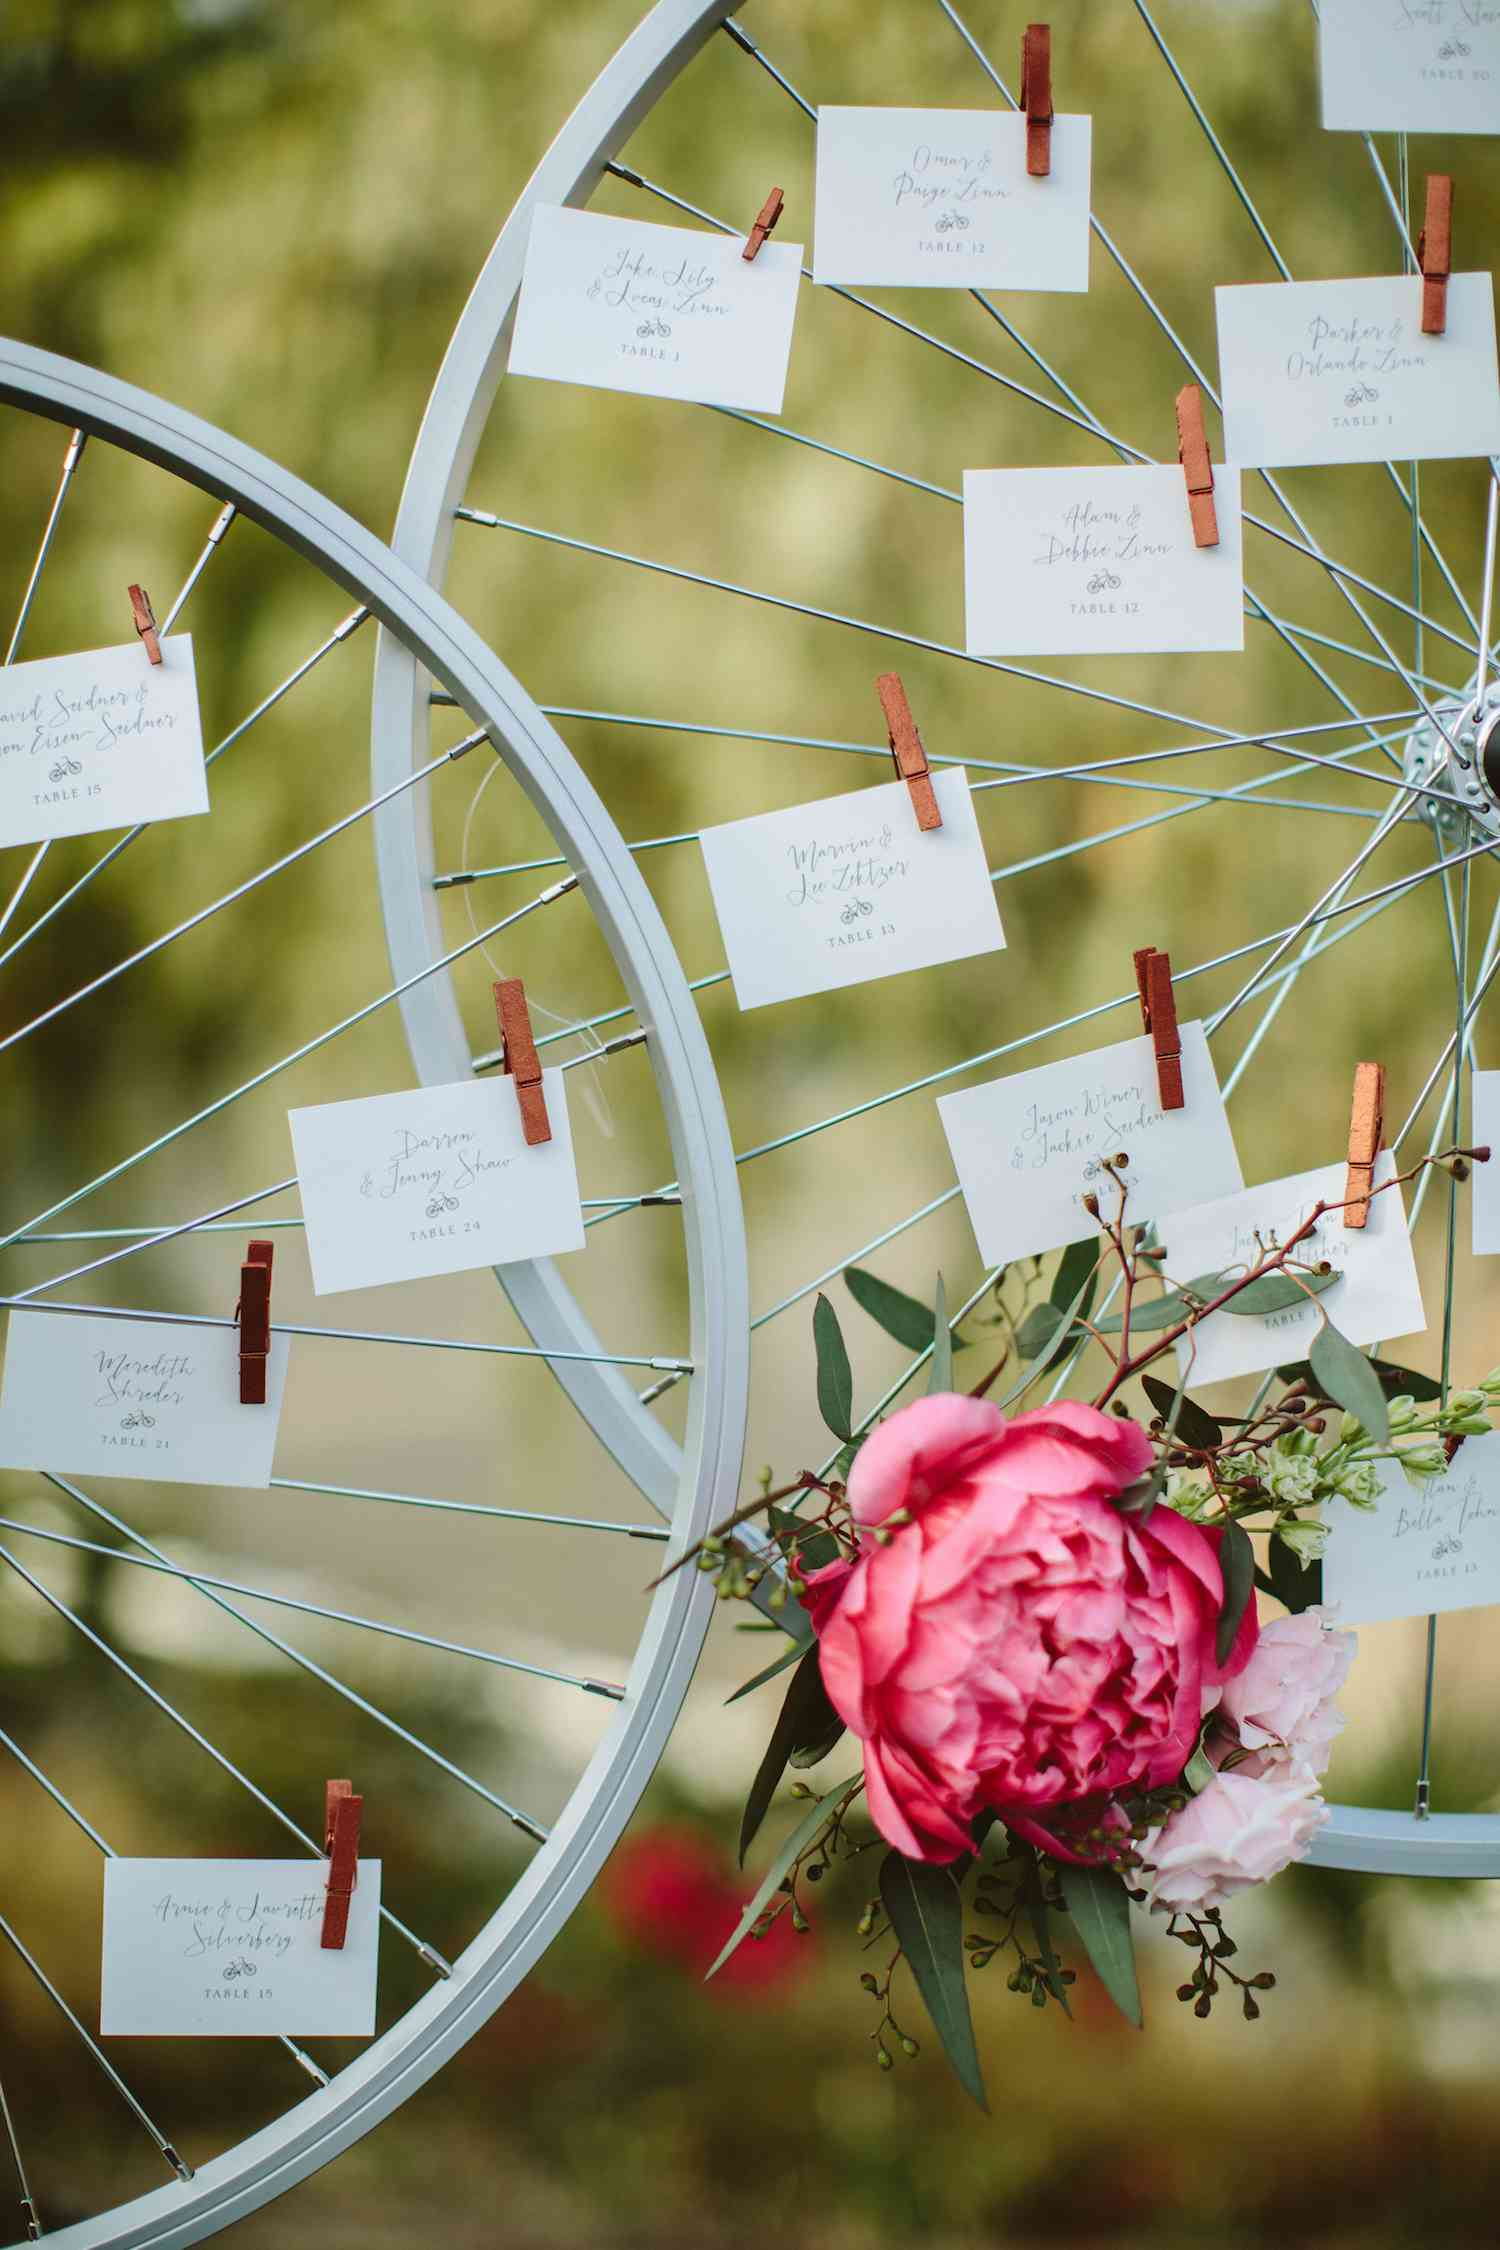 Bike tire escort cards